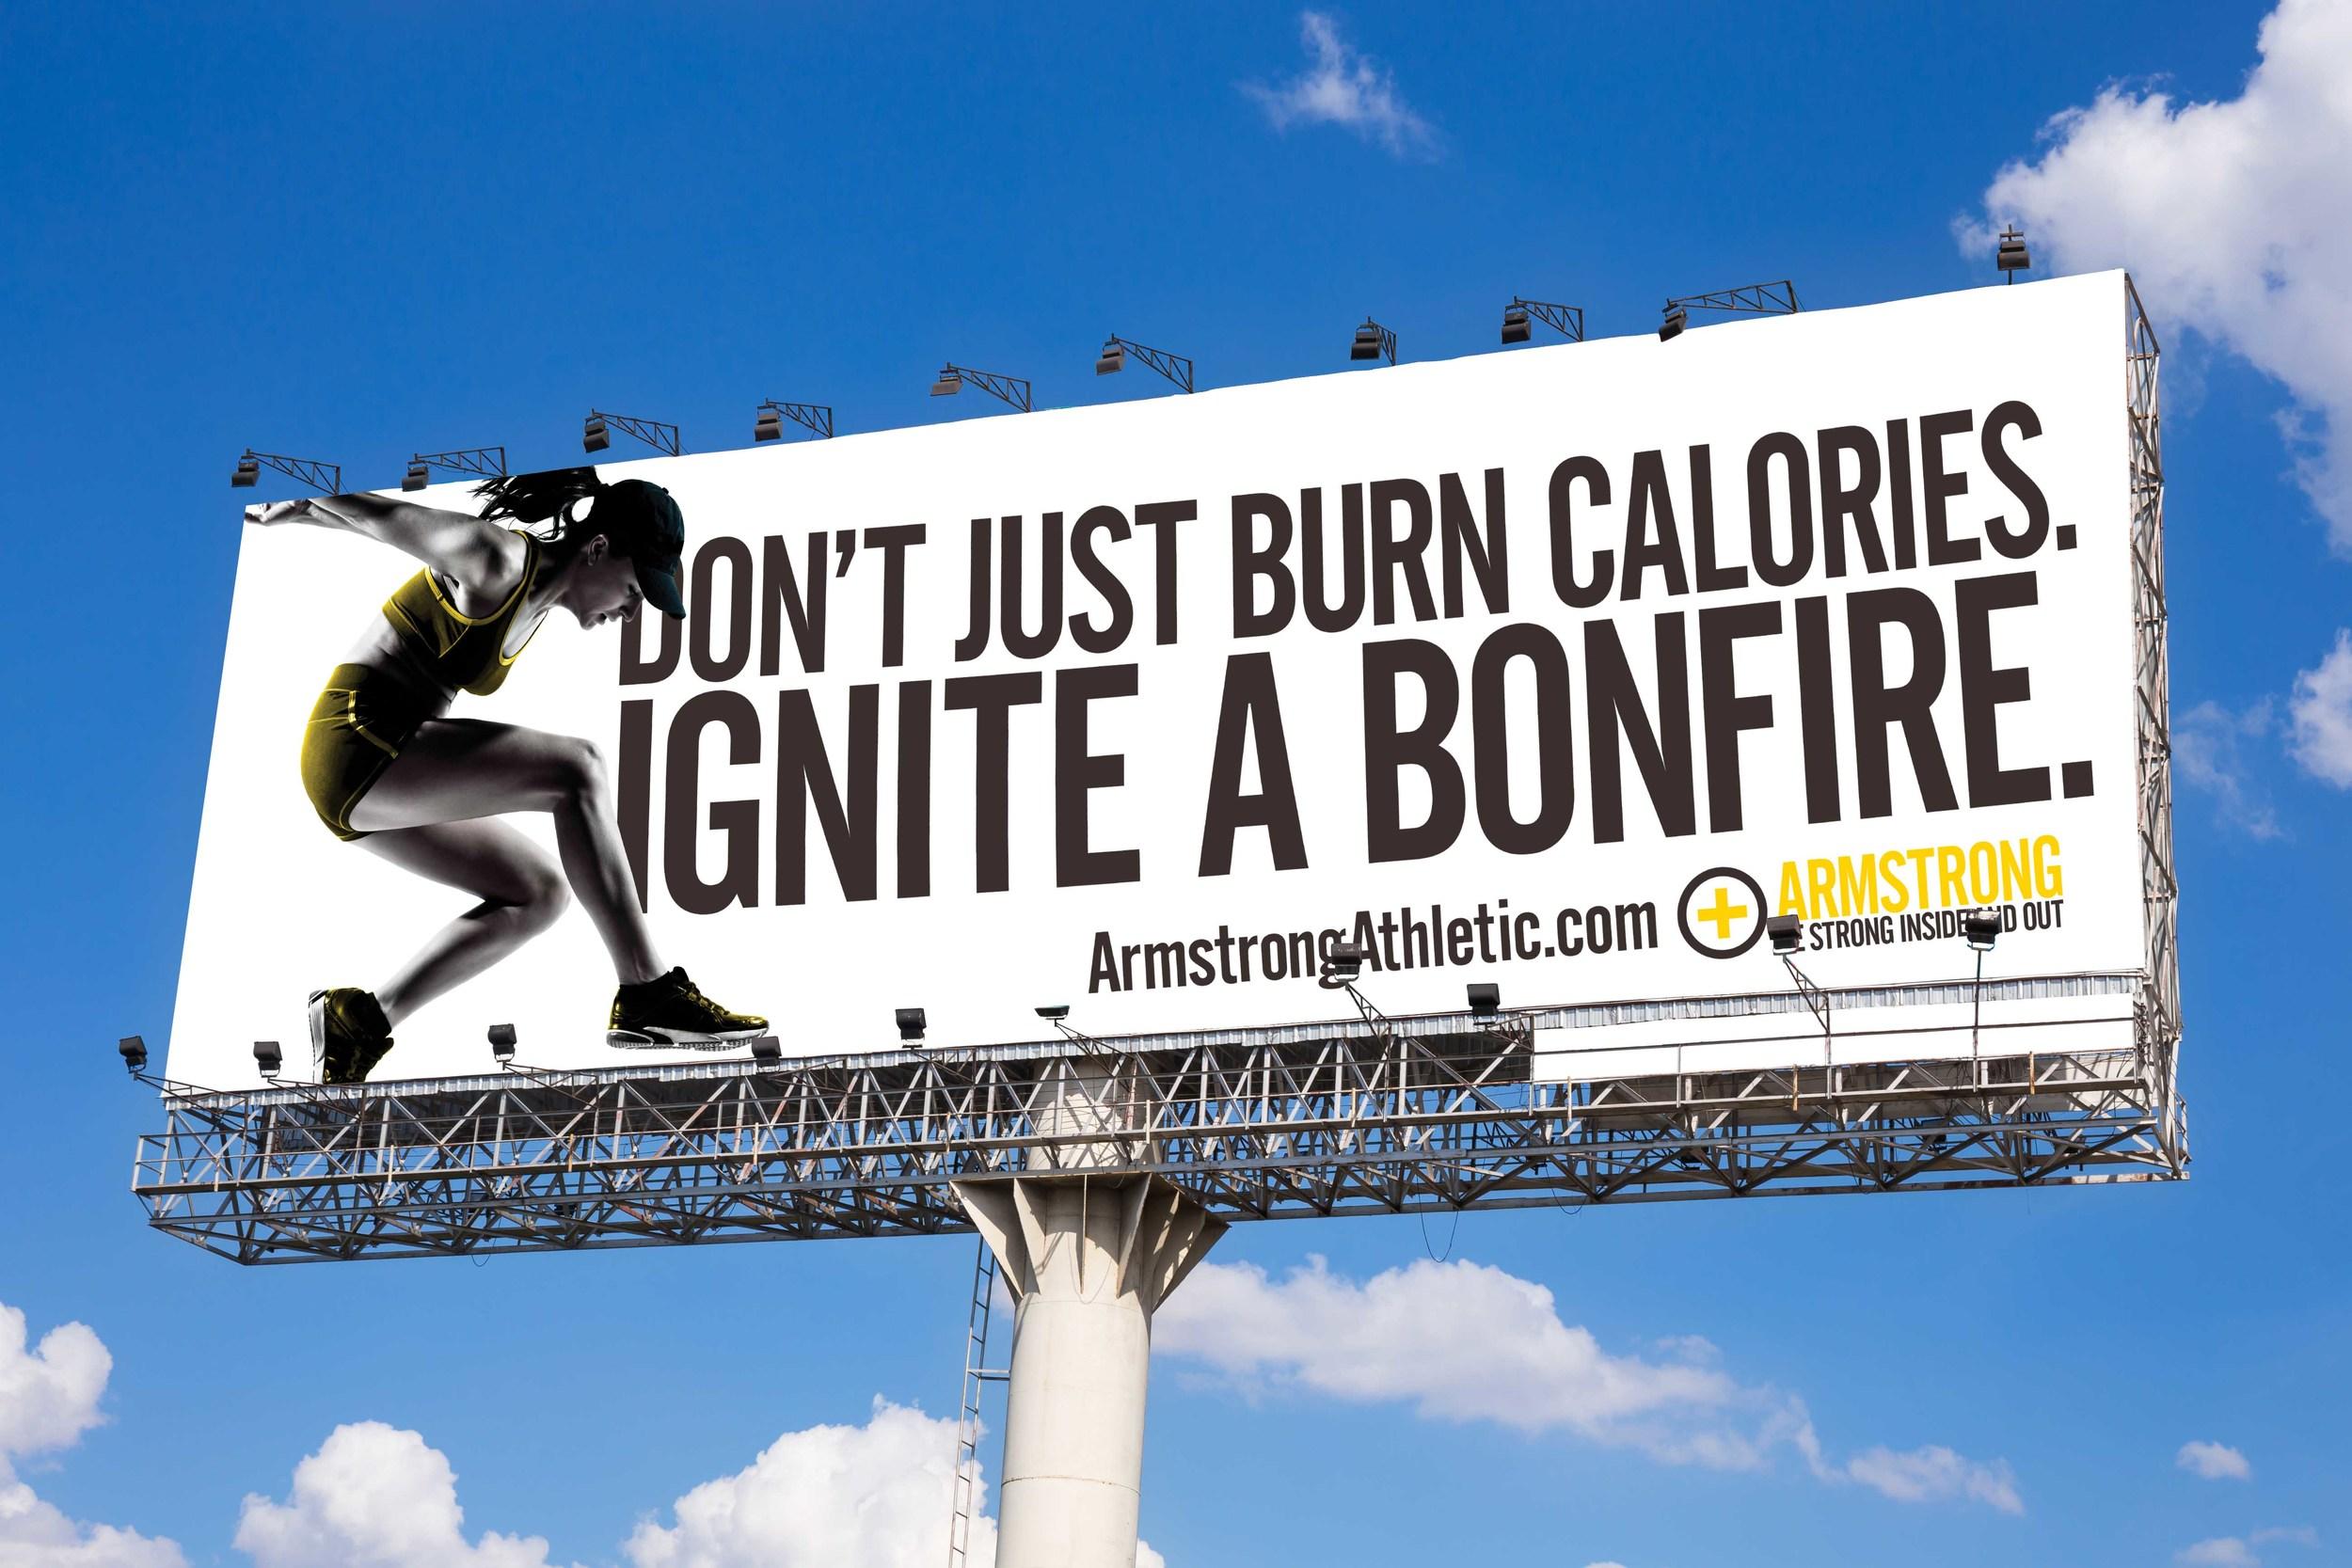 ARM.bonfire_billboard.jpg